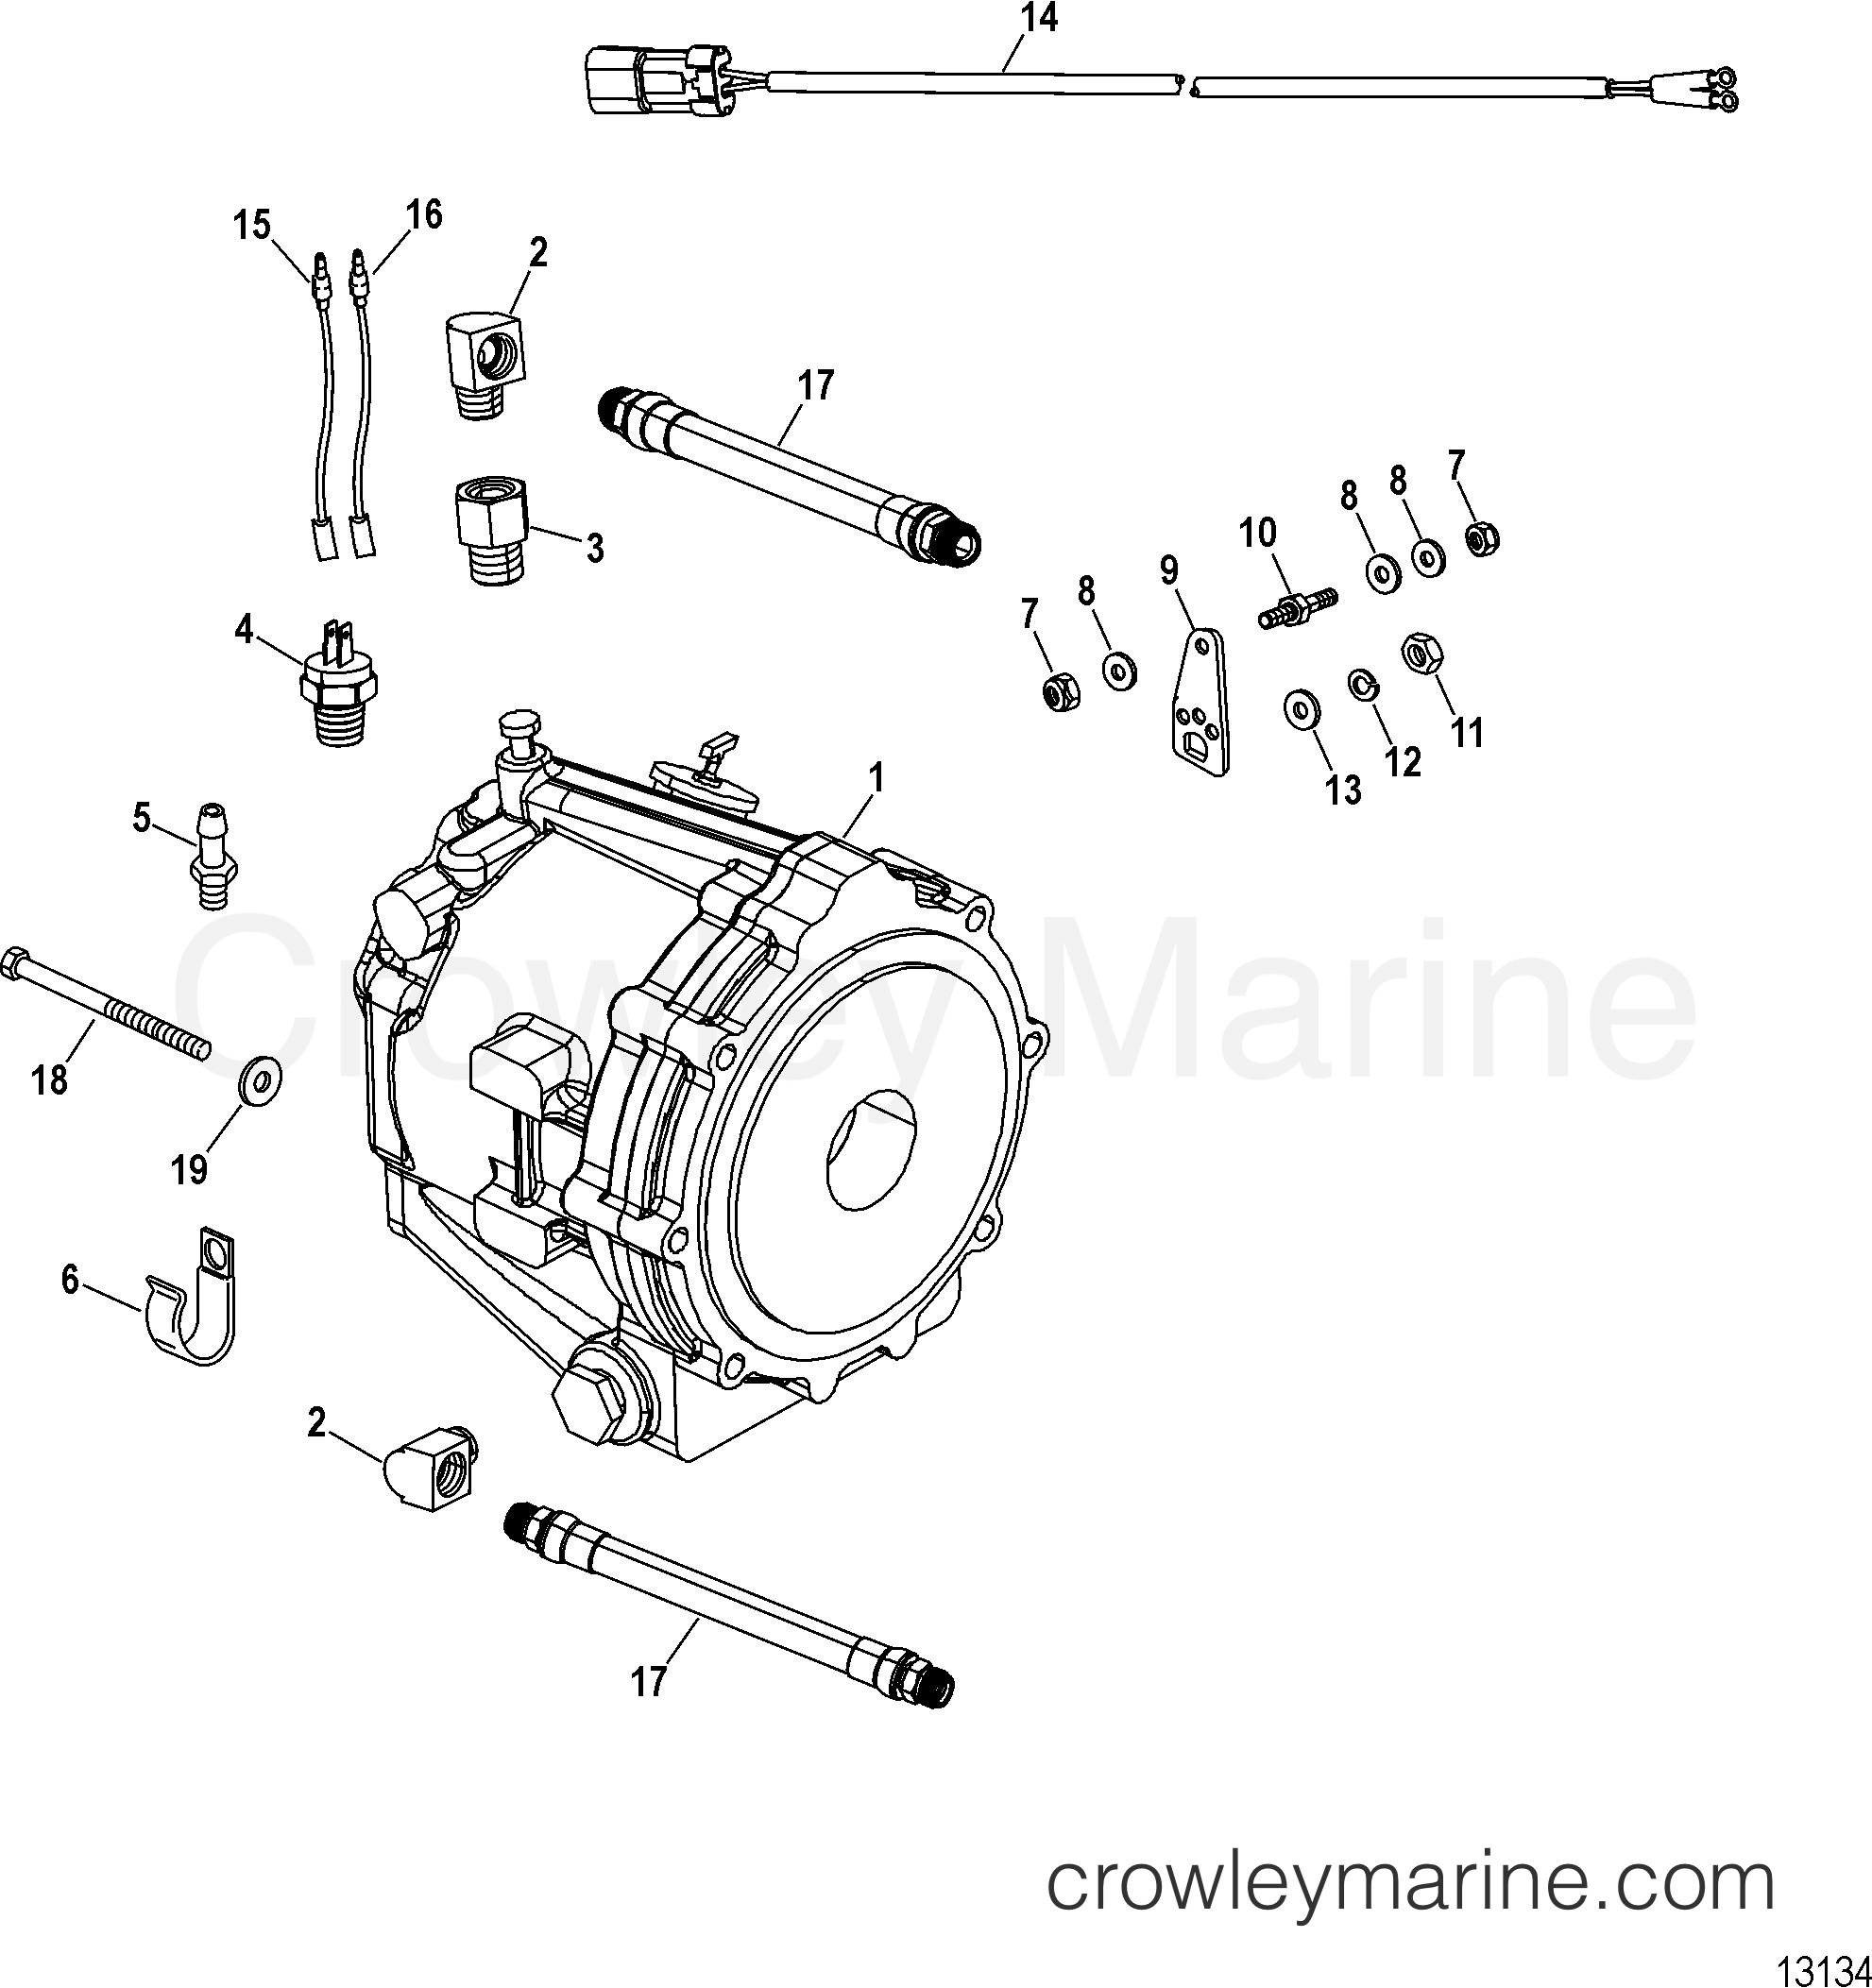 Mercruiser Driveline Diagram Automotive Wiring Subaru Transmission 2006 Race Sterndrive 600 Sci Rh Crowleymarine Com Drivetrain 1997 Ford